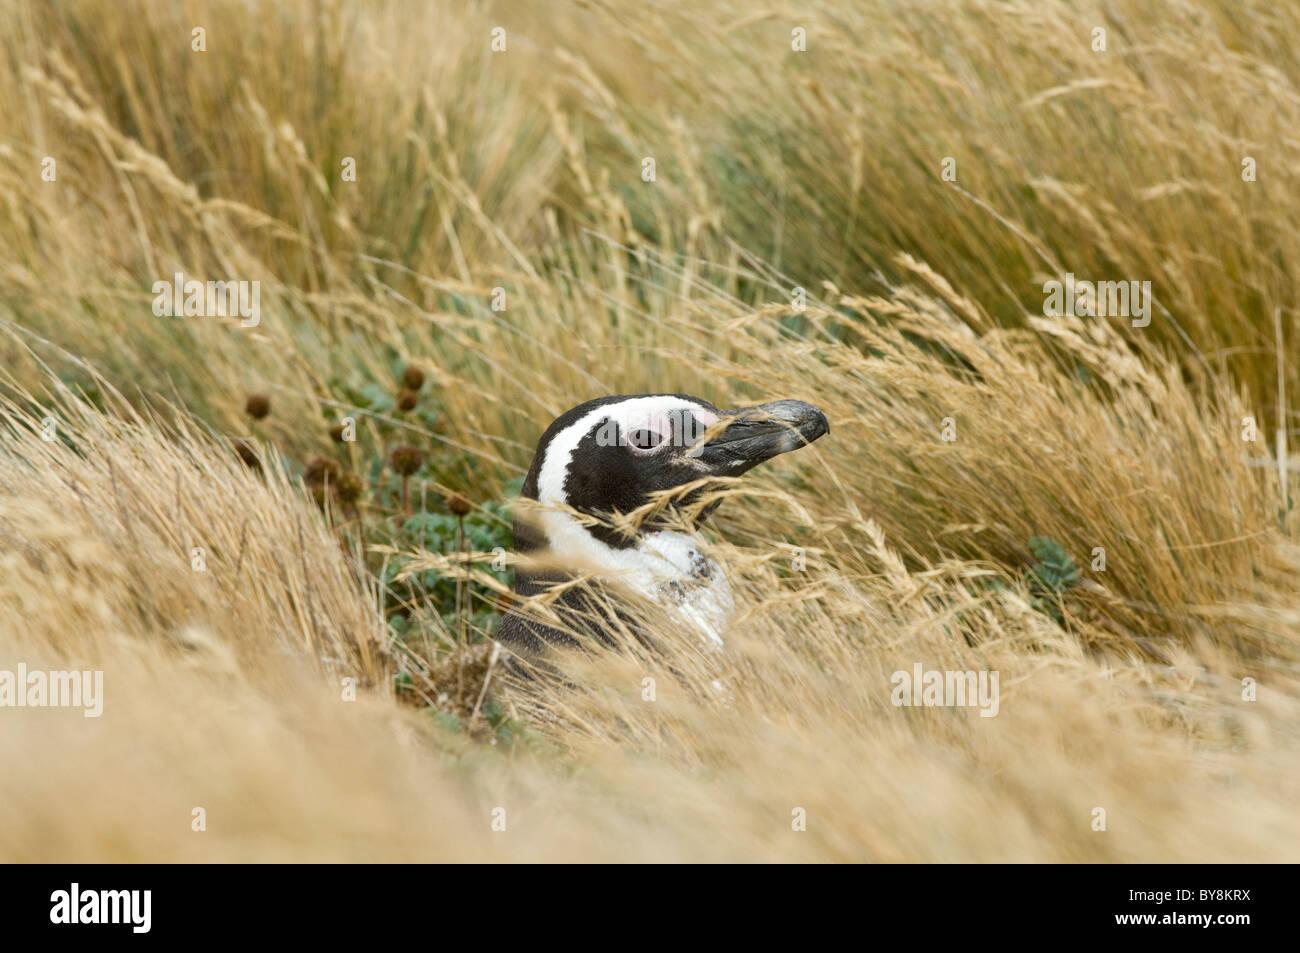 Magellanic penguin (Spheniscus magellanicus) adult, at the burrow entrance amongst grasses Otway Fjord NW of Punta Arenas Chile Stock Photo